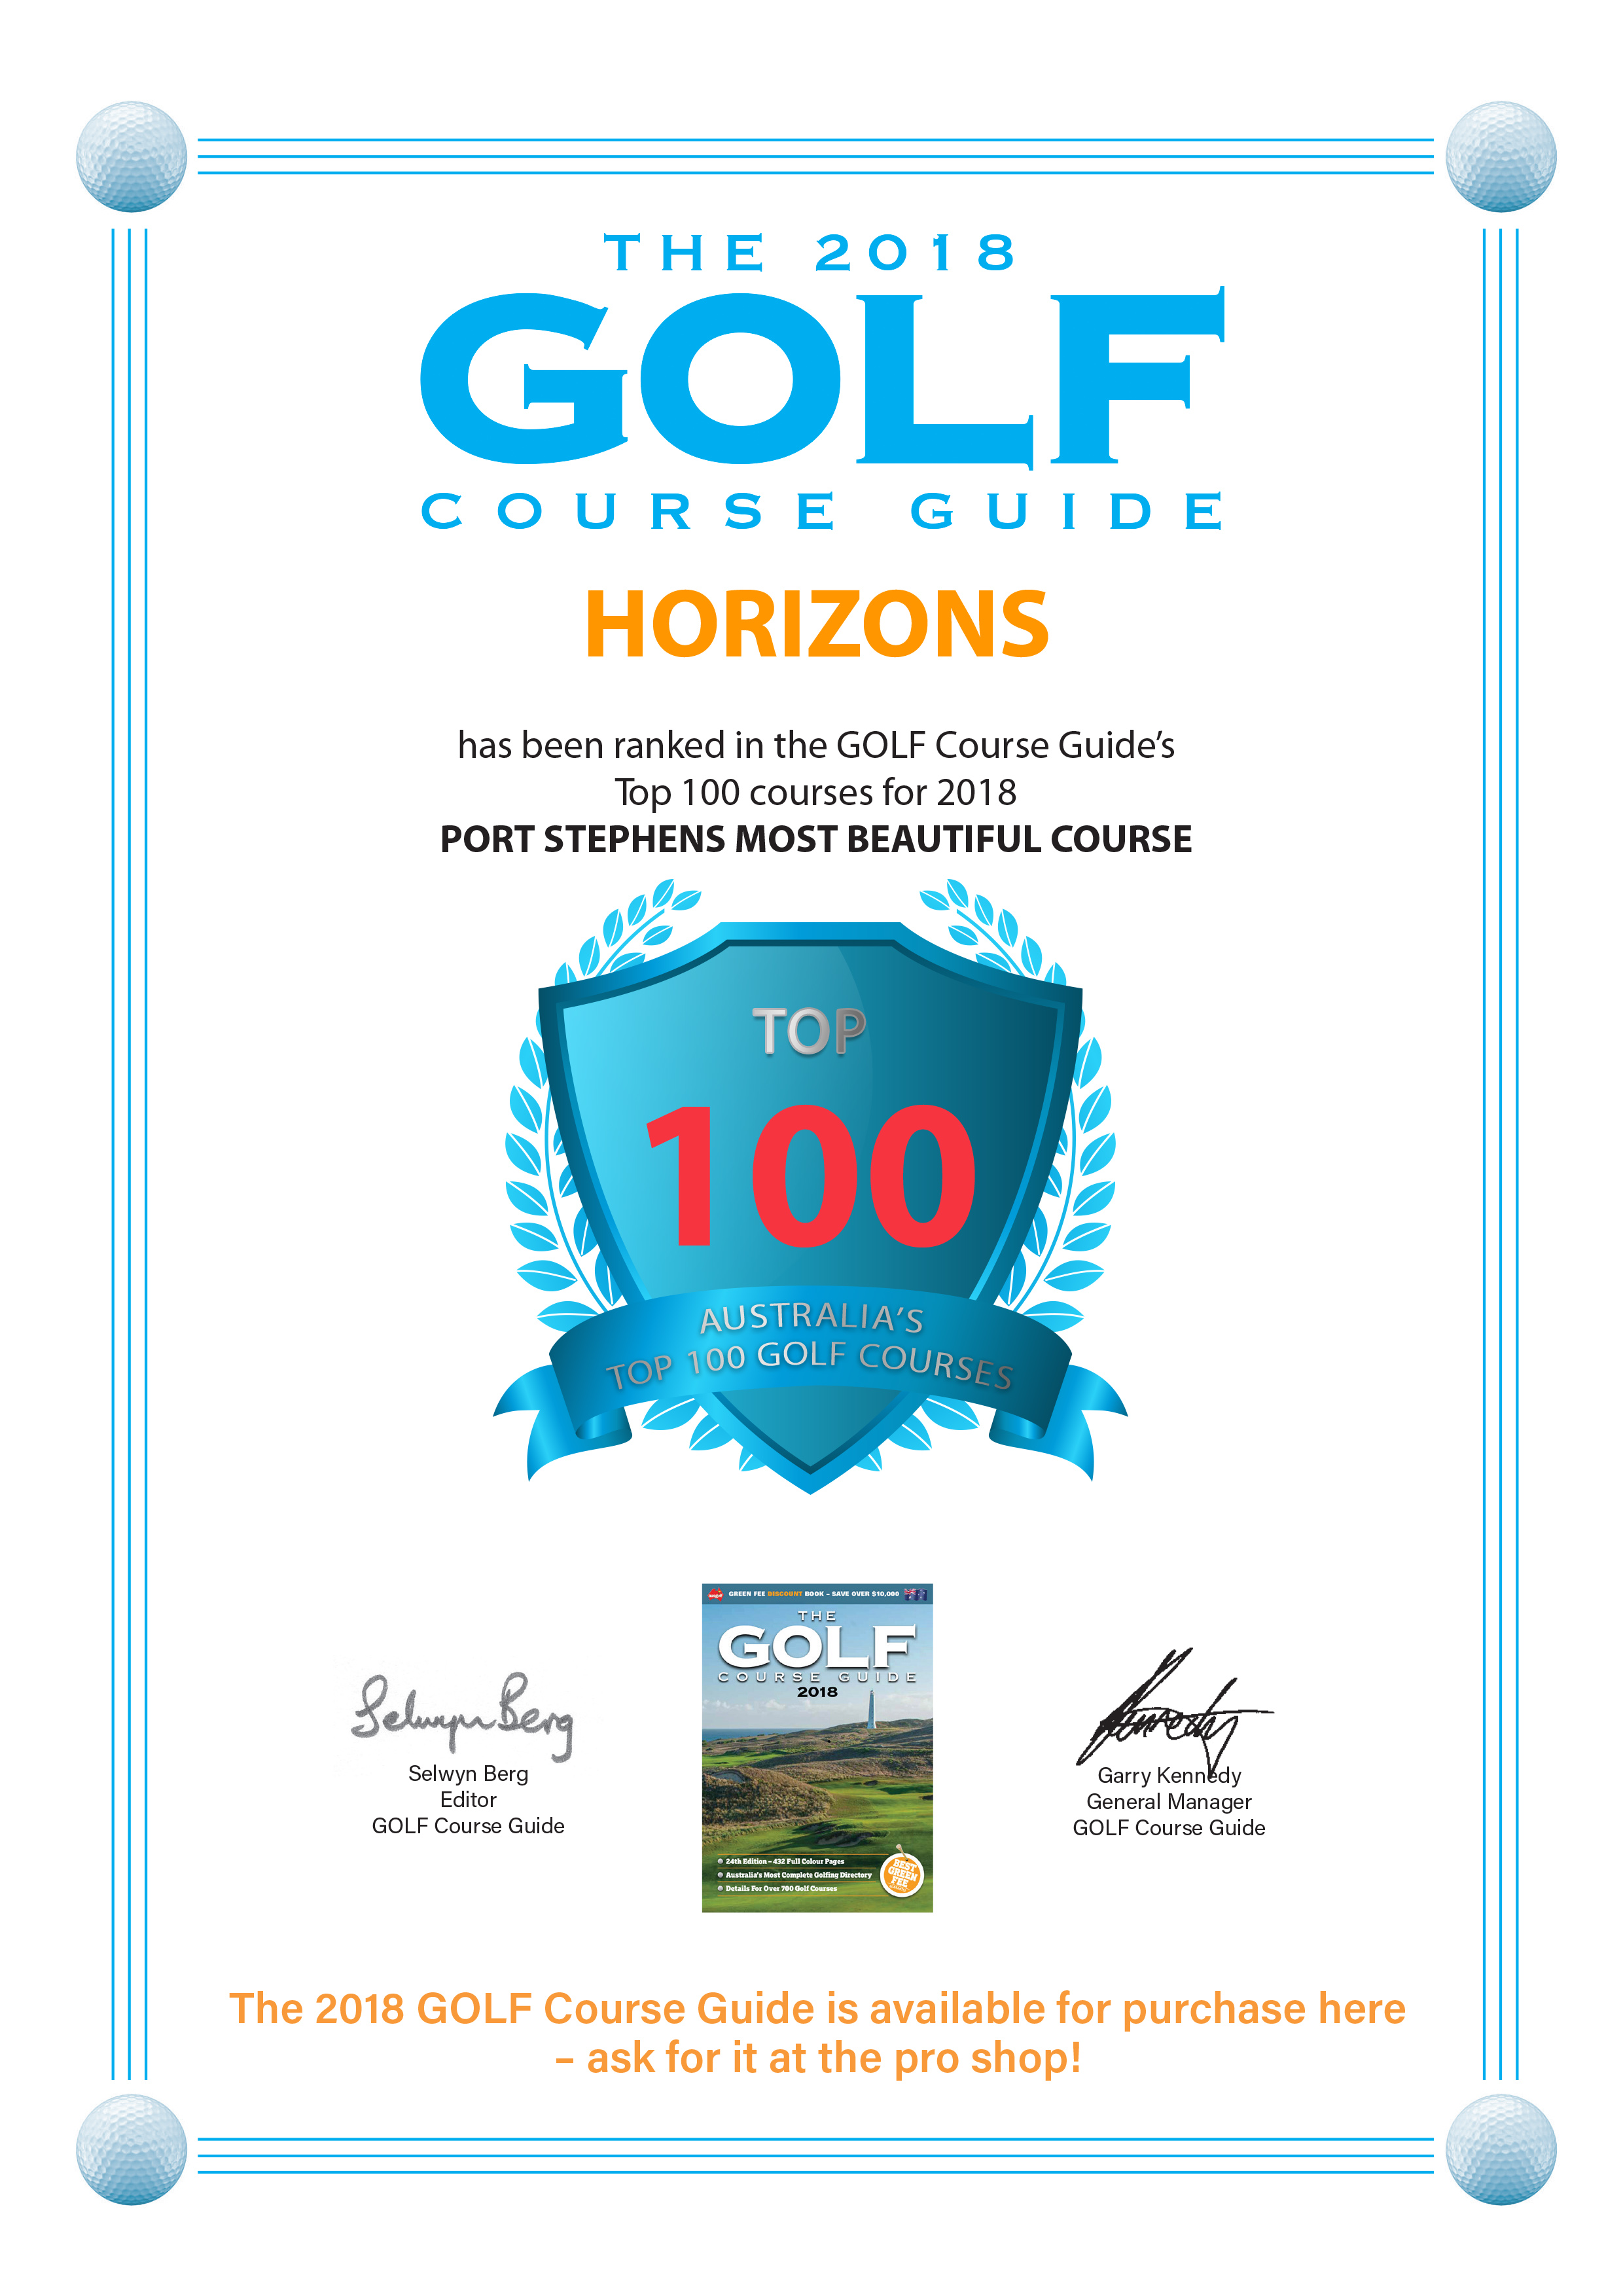 Horizons Top 100 Australian Course 2018 golf course guide